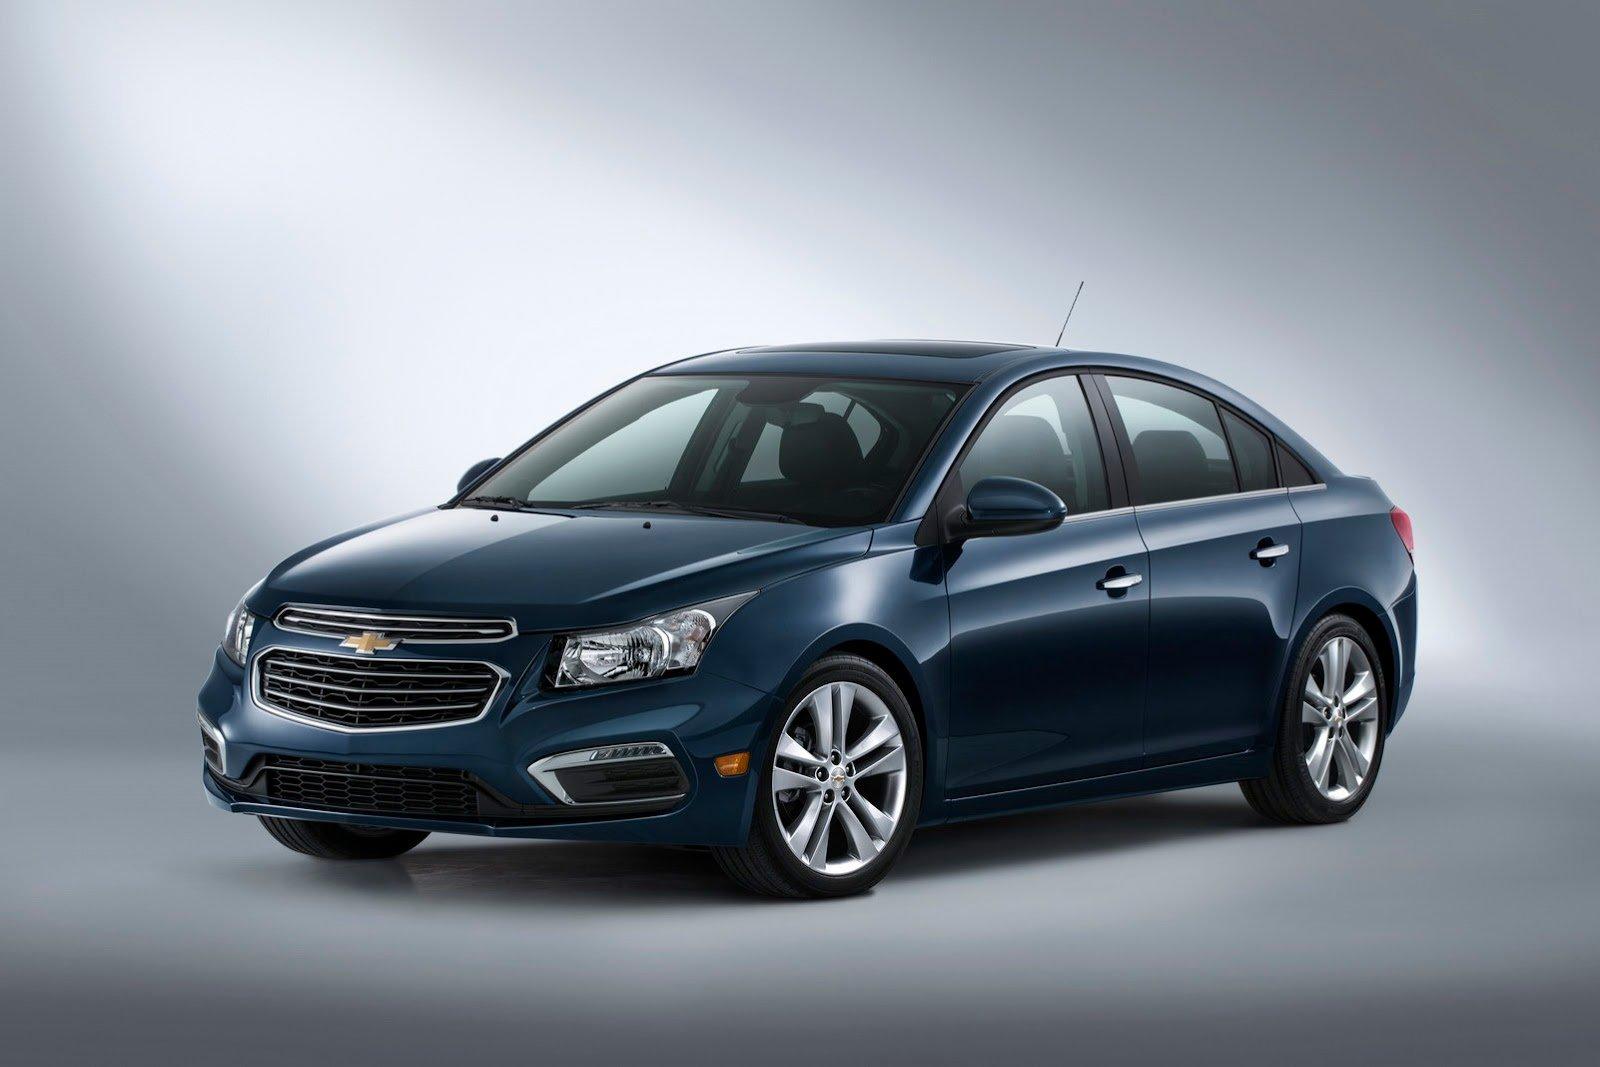 Нью-Йорк-2014: Chevrolet (Шевроле) подновил Cruze (Круз)